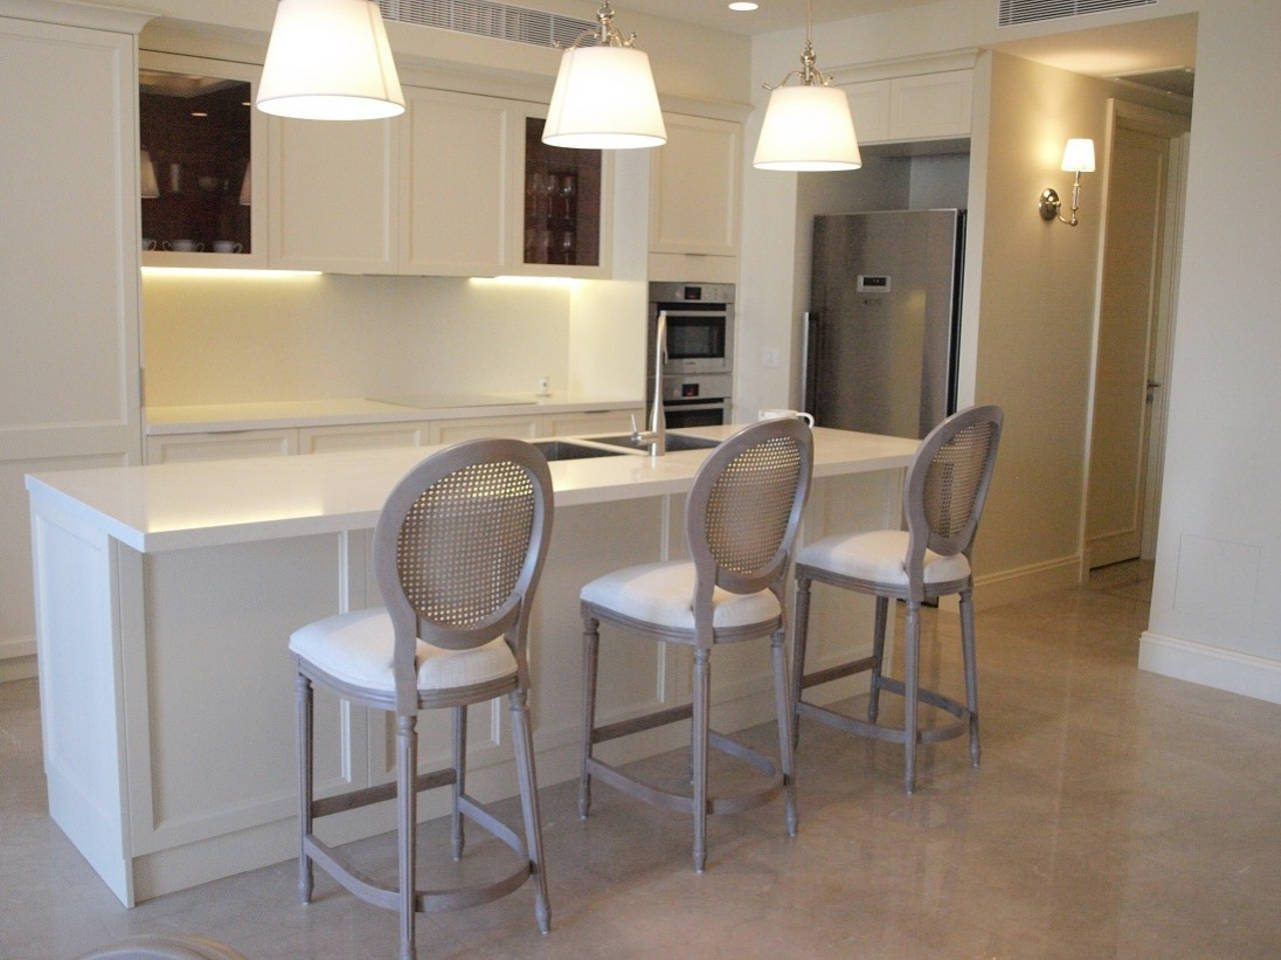 Apartment Great Location - Mamilla Mall Super Luxurious Flat photo 16817581